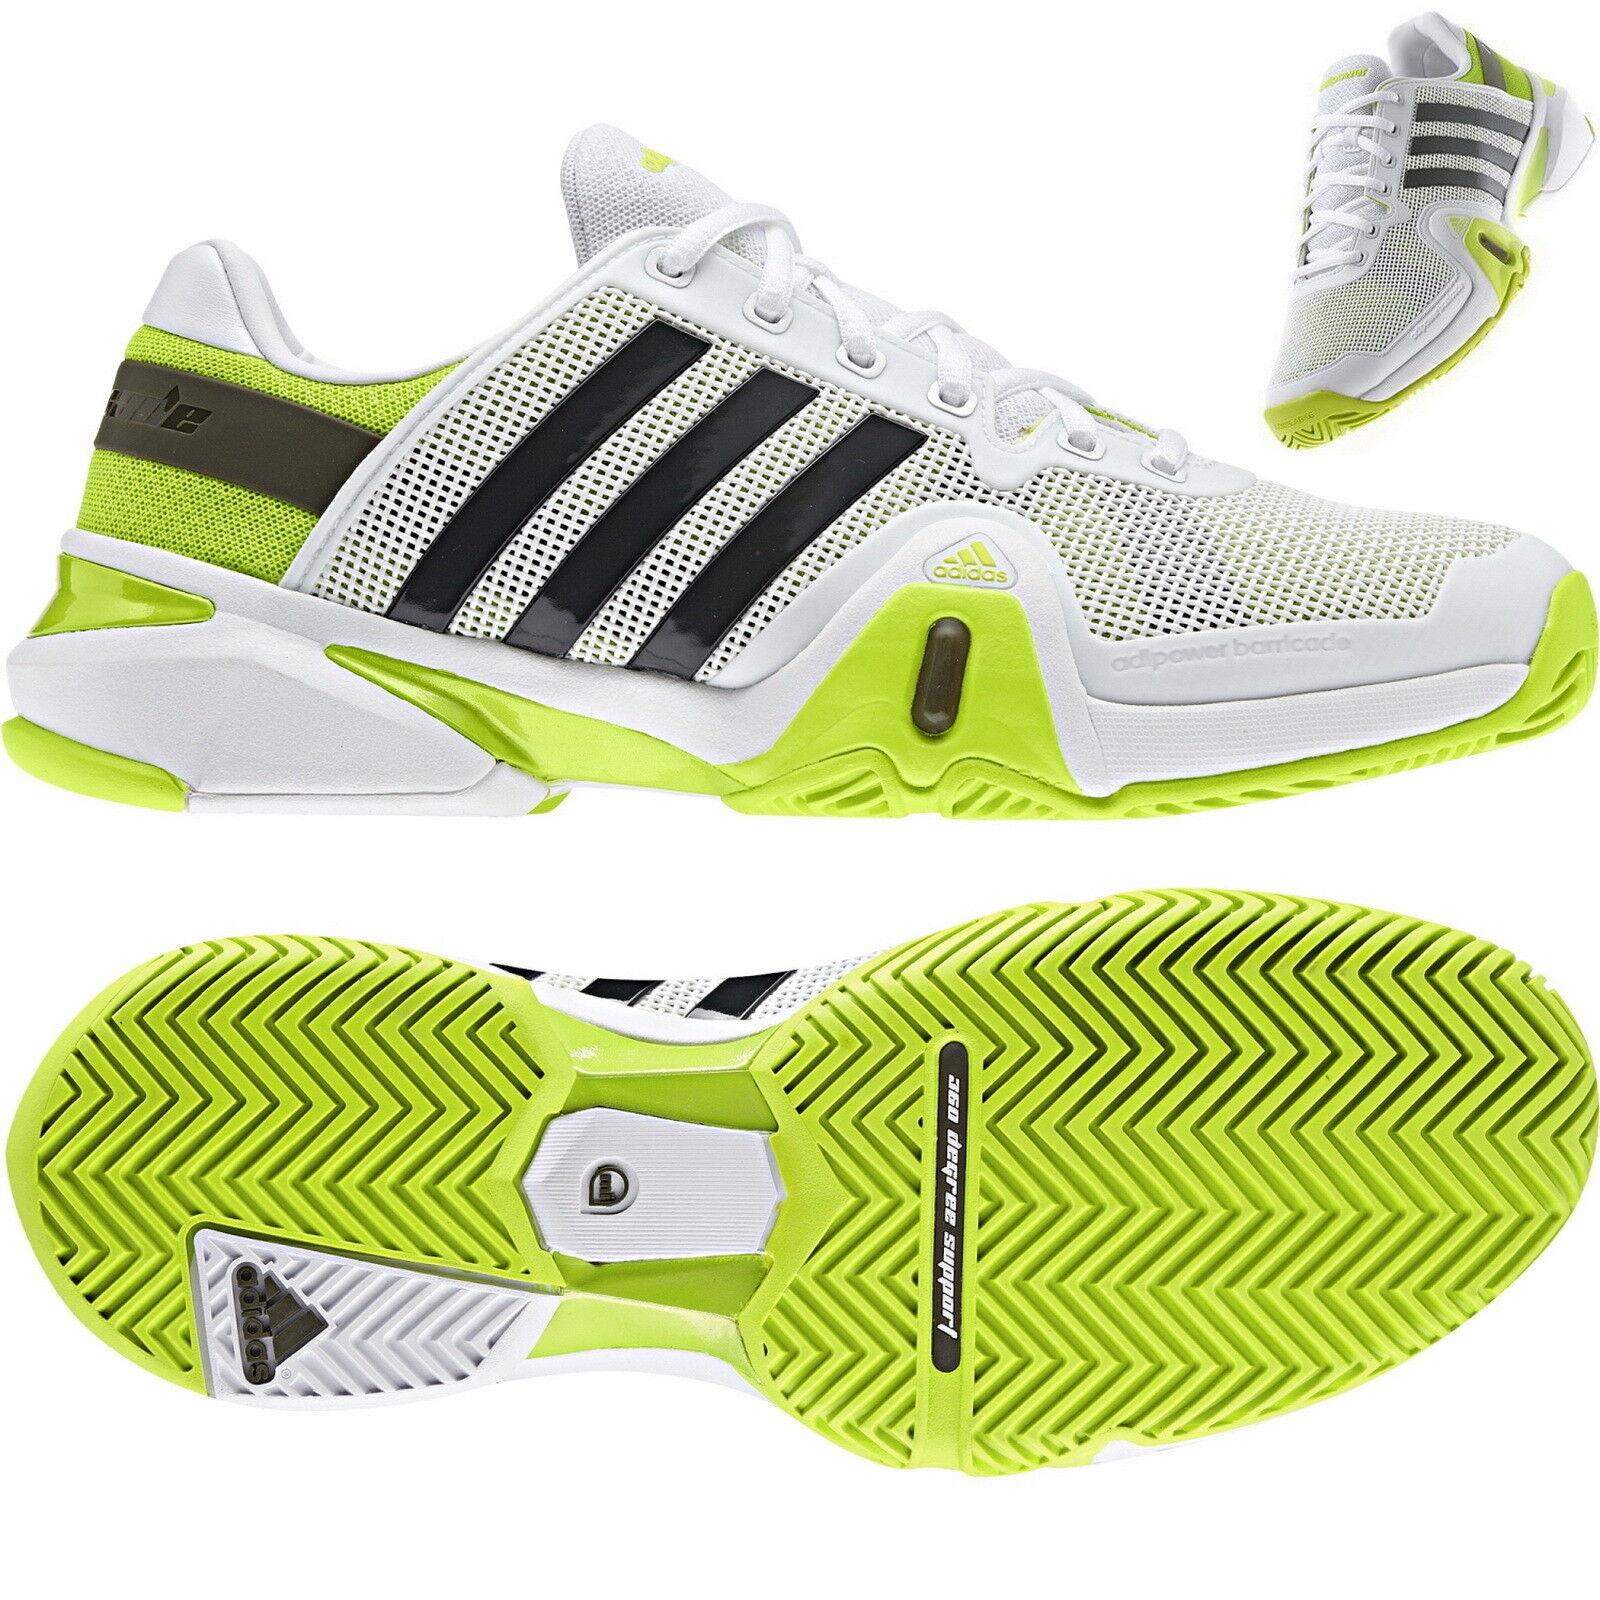 Adidas Adidas Adidas Adipower Barricade 8 Tennis Herren F32331 Weiß fluorescent 9227bc